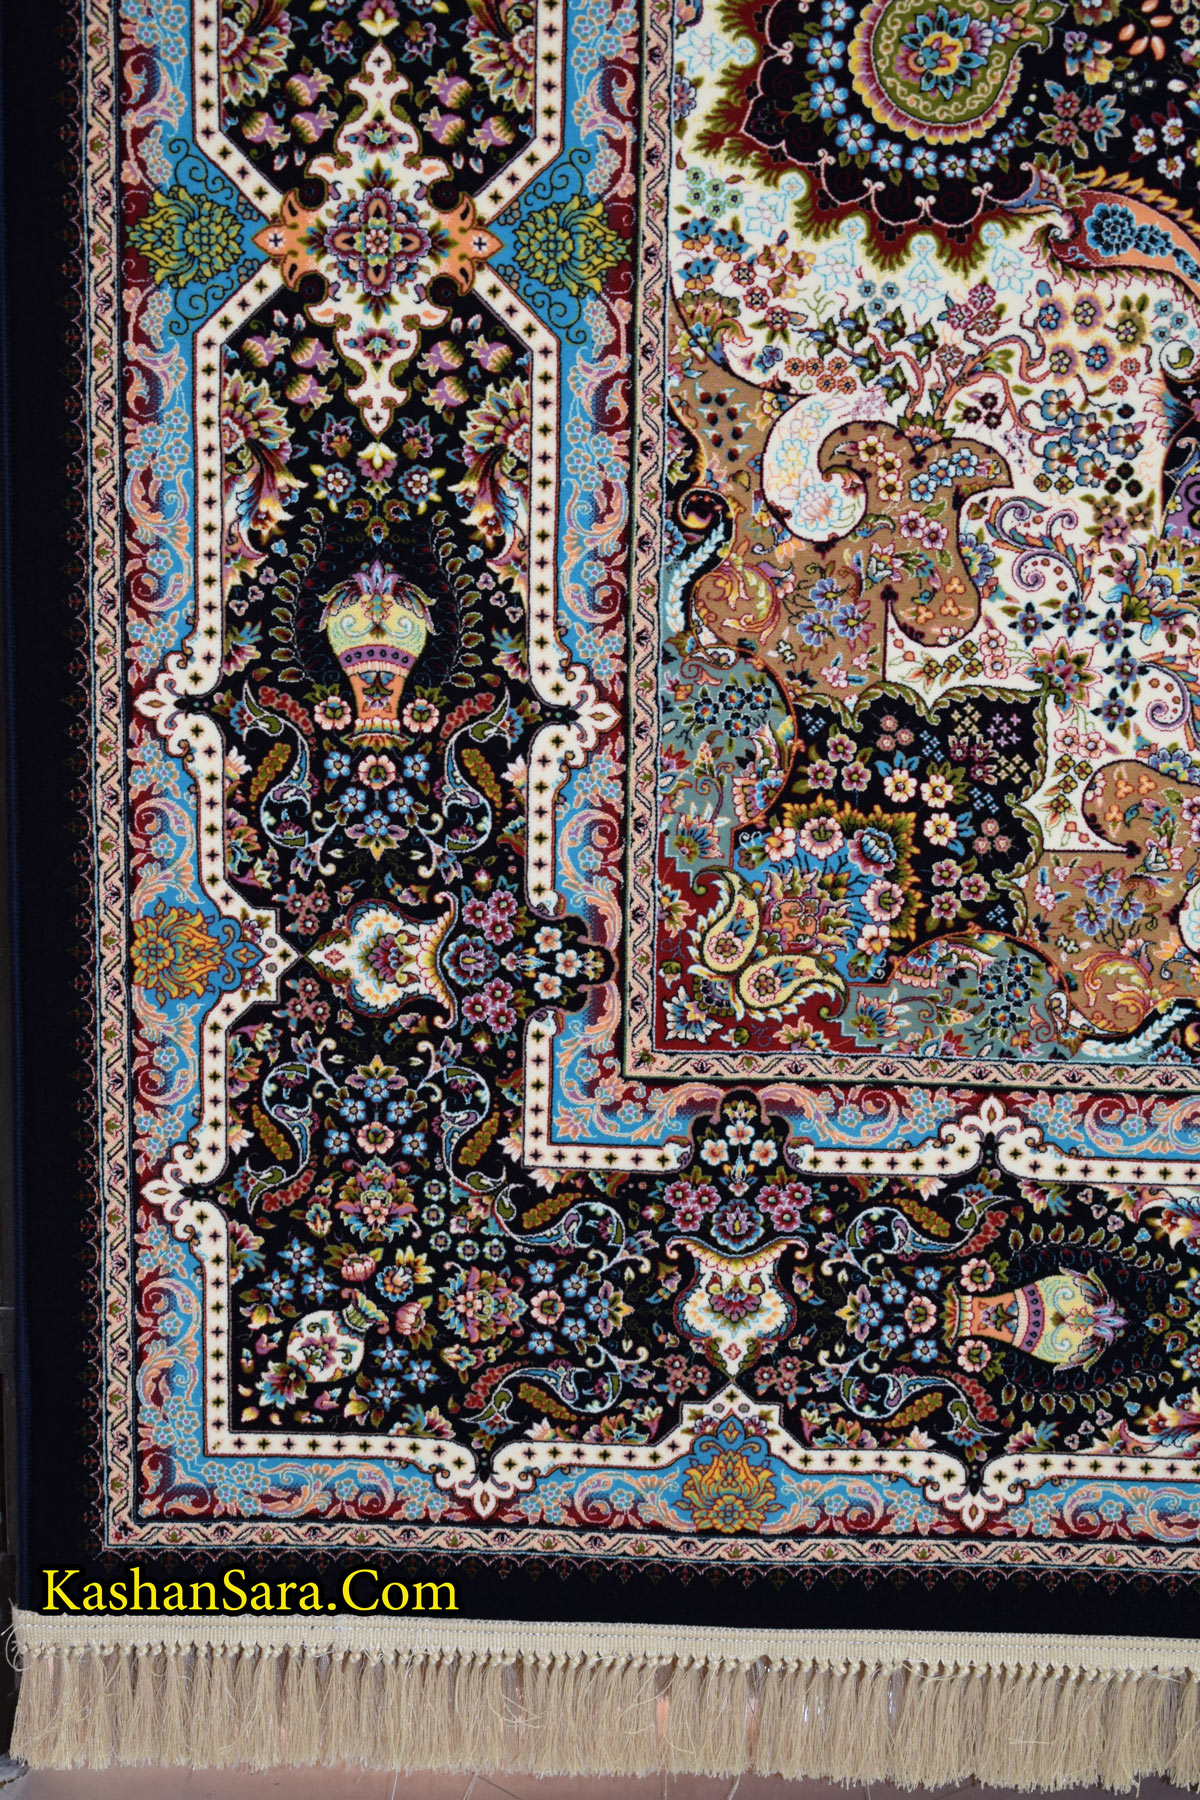 قیمت فرش ماشینی کاشان طرح خاتون ۱۲۰۰ شانه